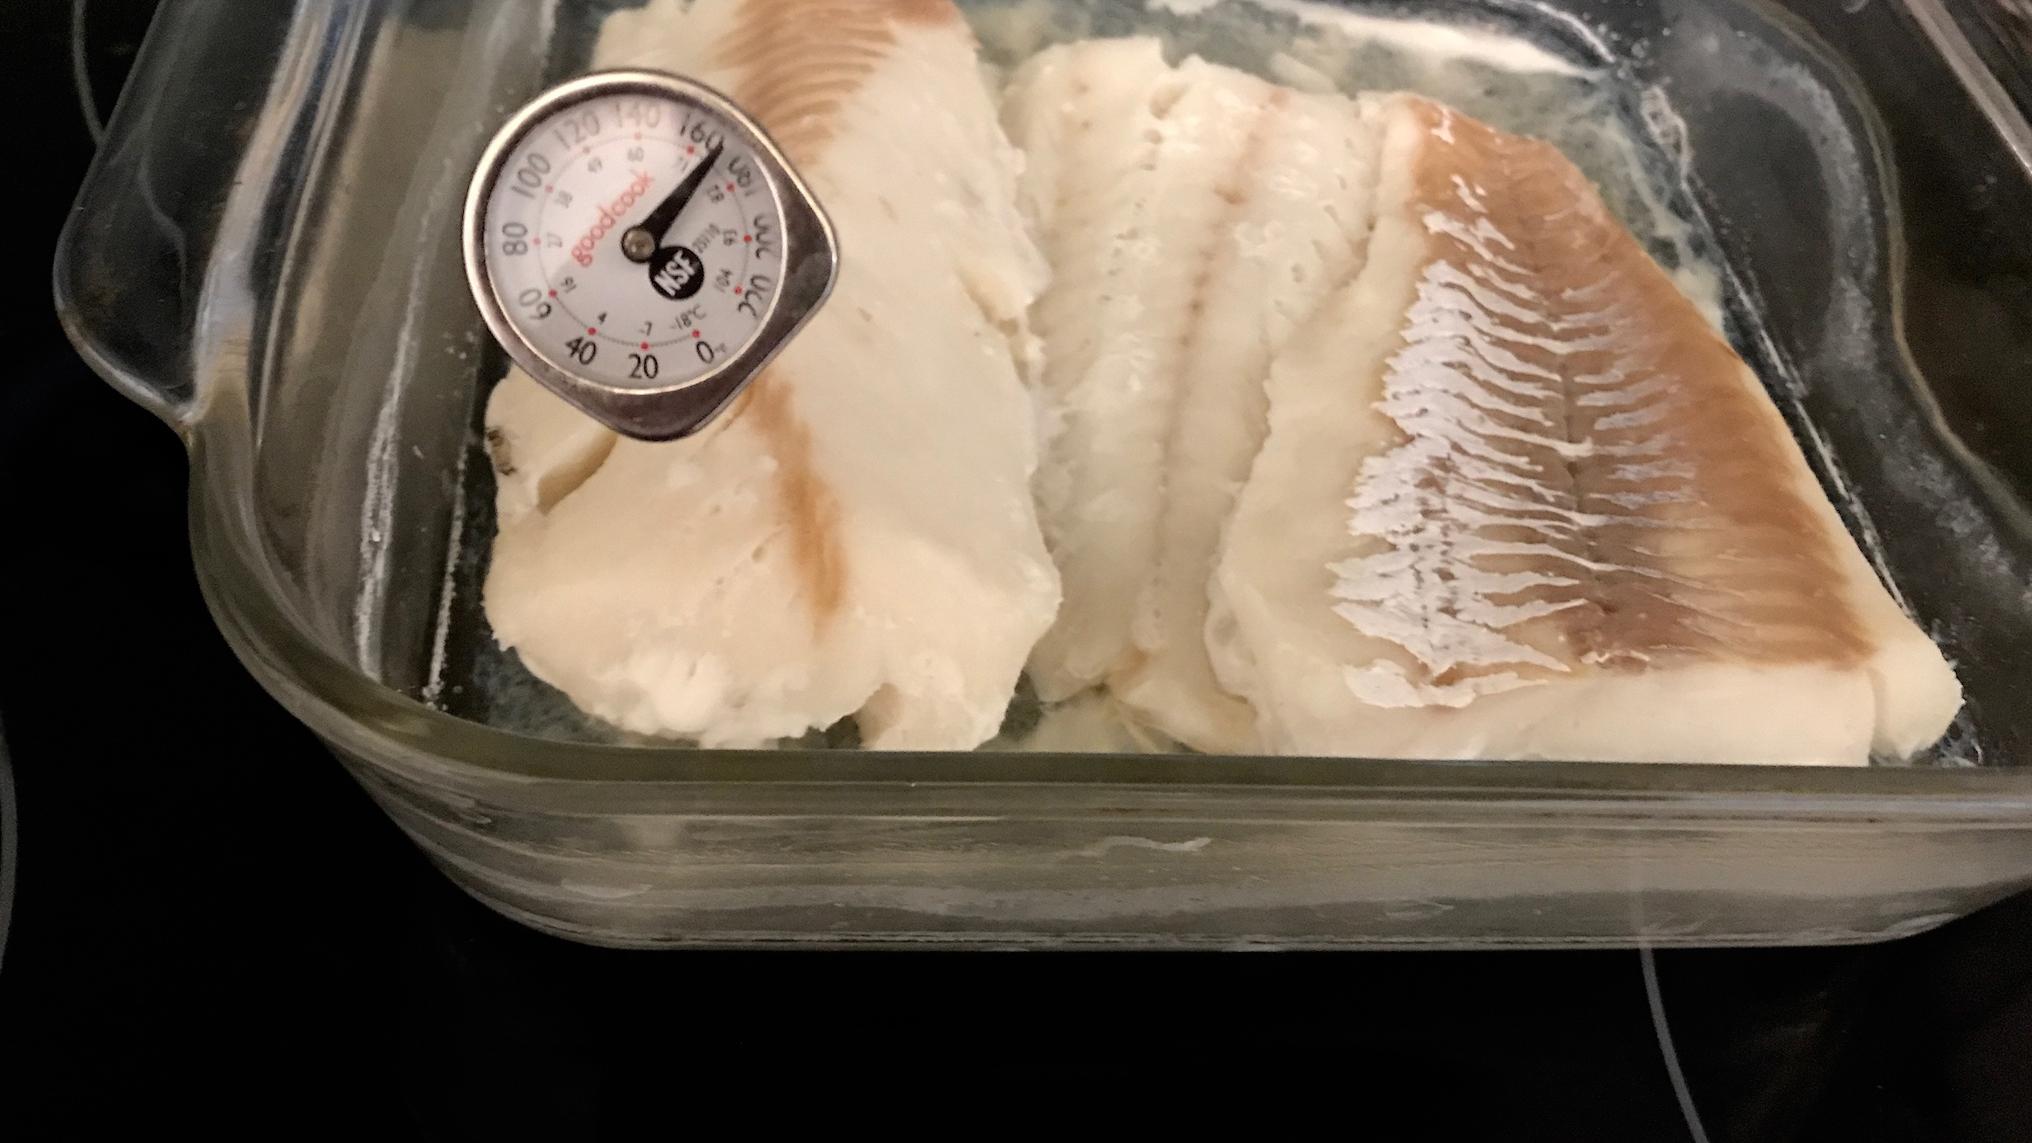 Fish in glass baking dish